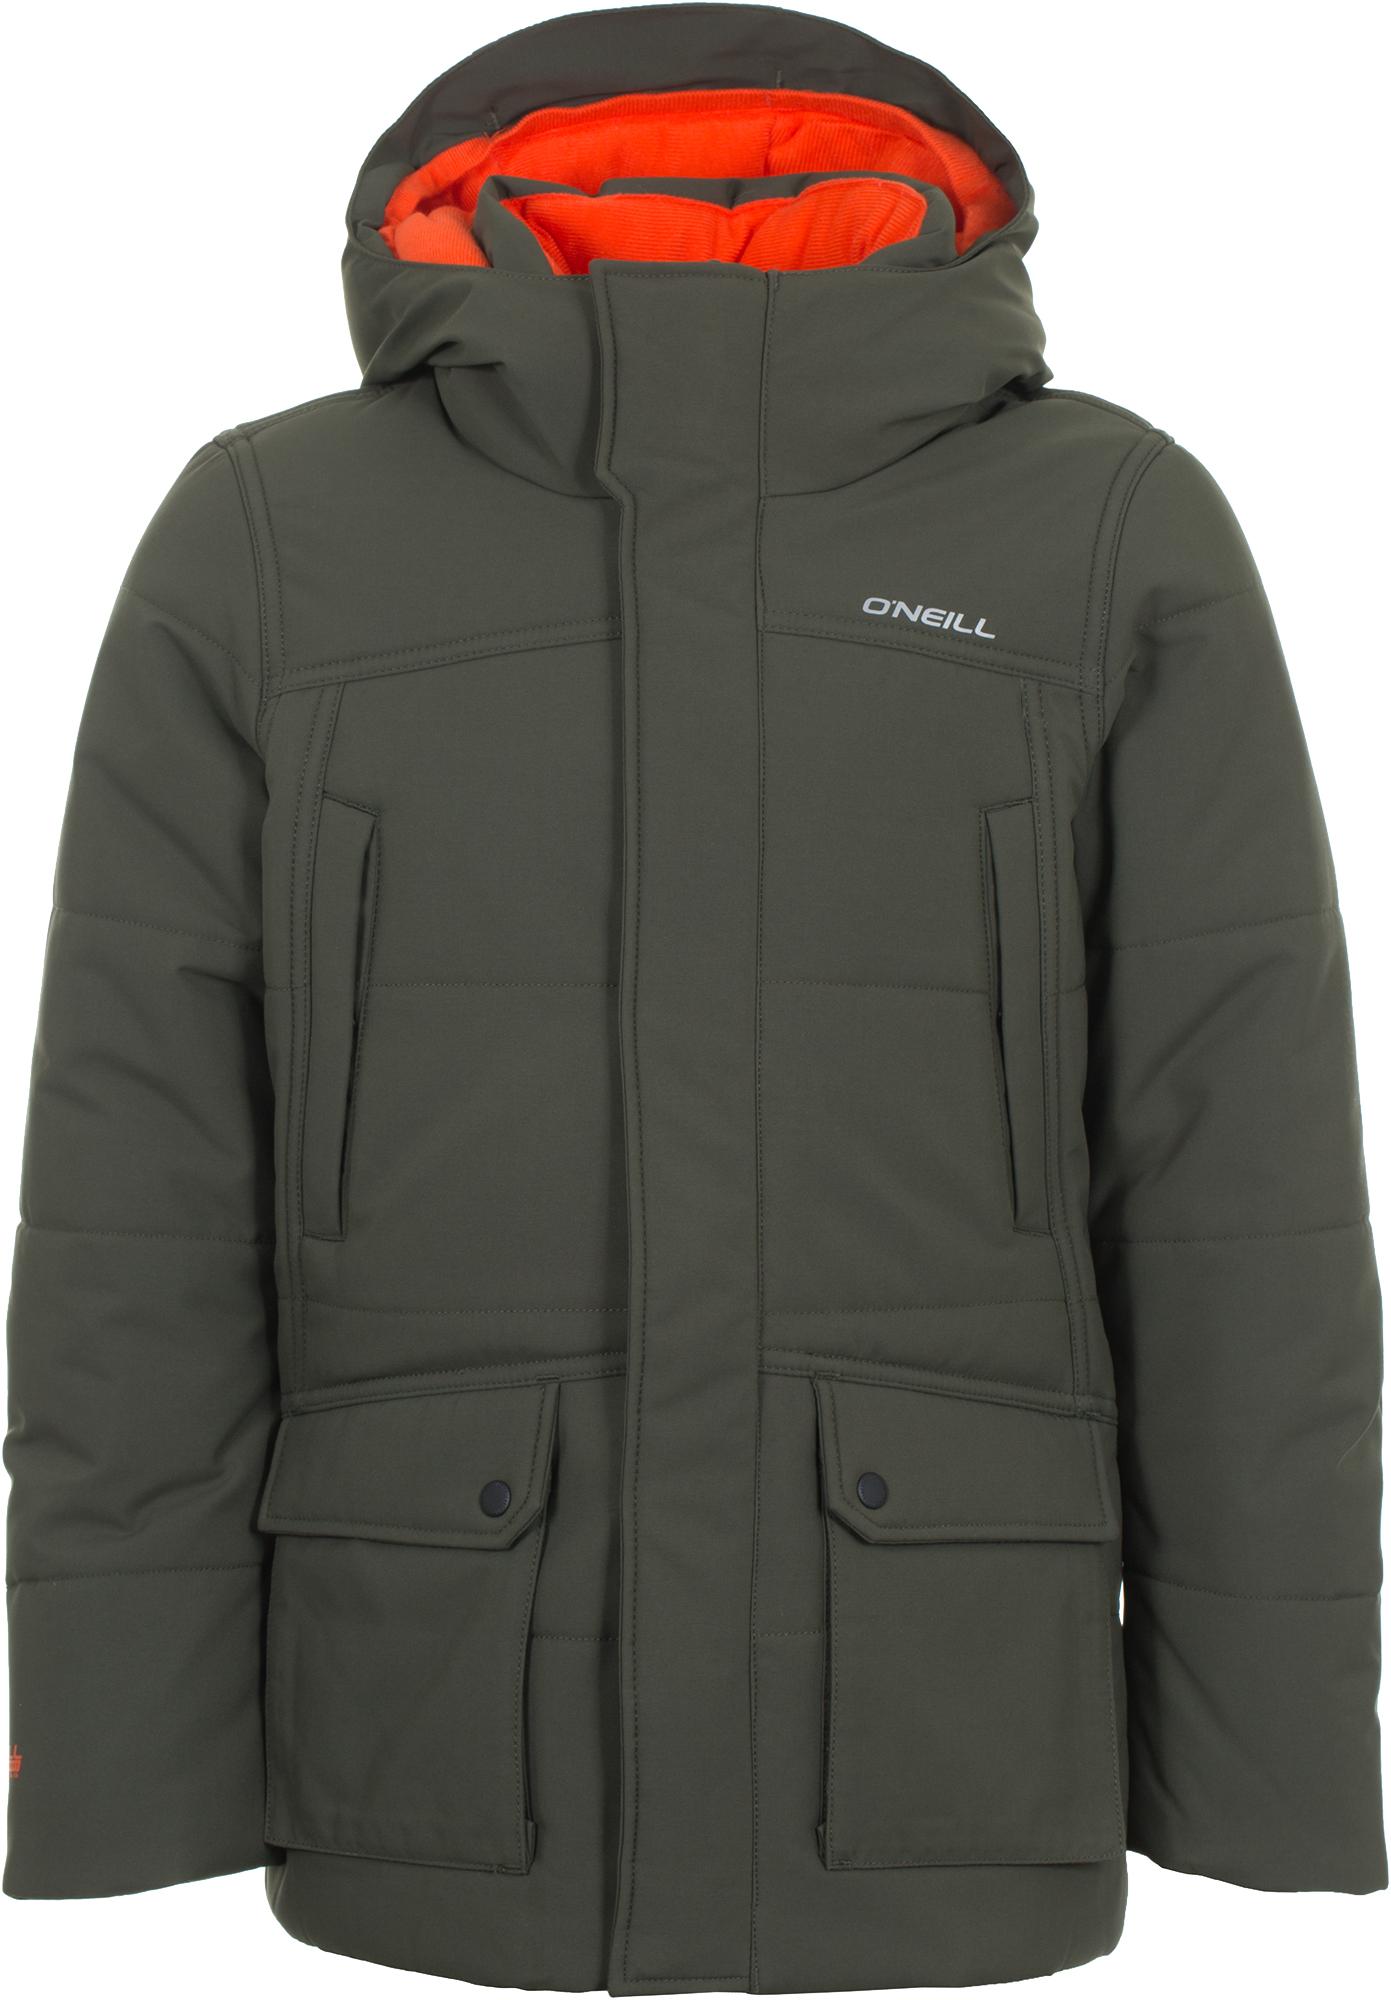 O'Neill Куртка утепленная для мальчиков O'Neill Pb Explorer, размер 176